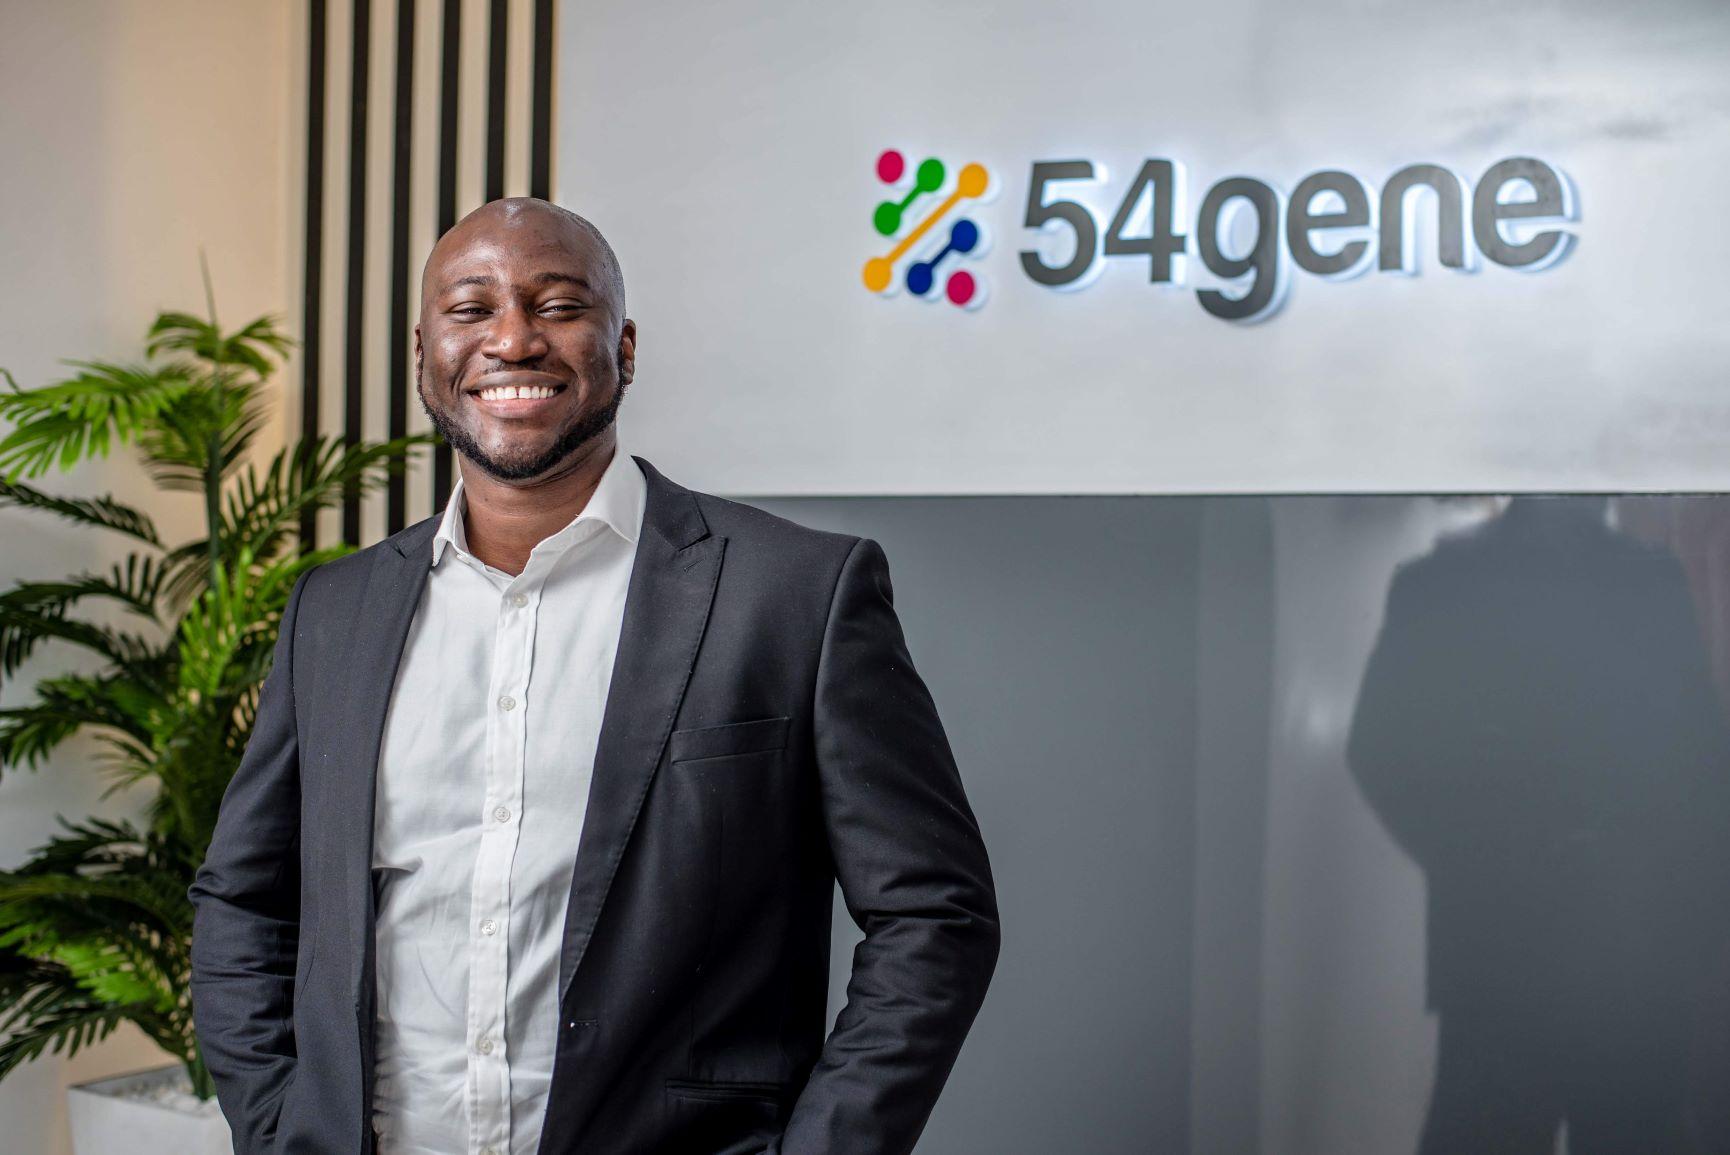 Nigeria health startups 54gene, MDaas Global raise big